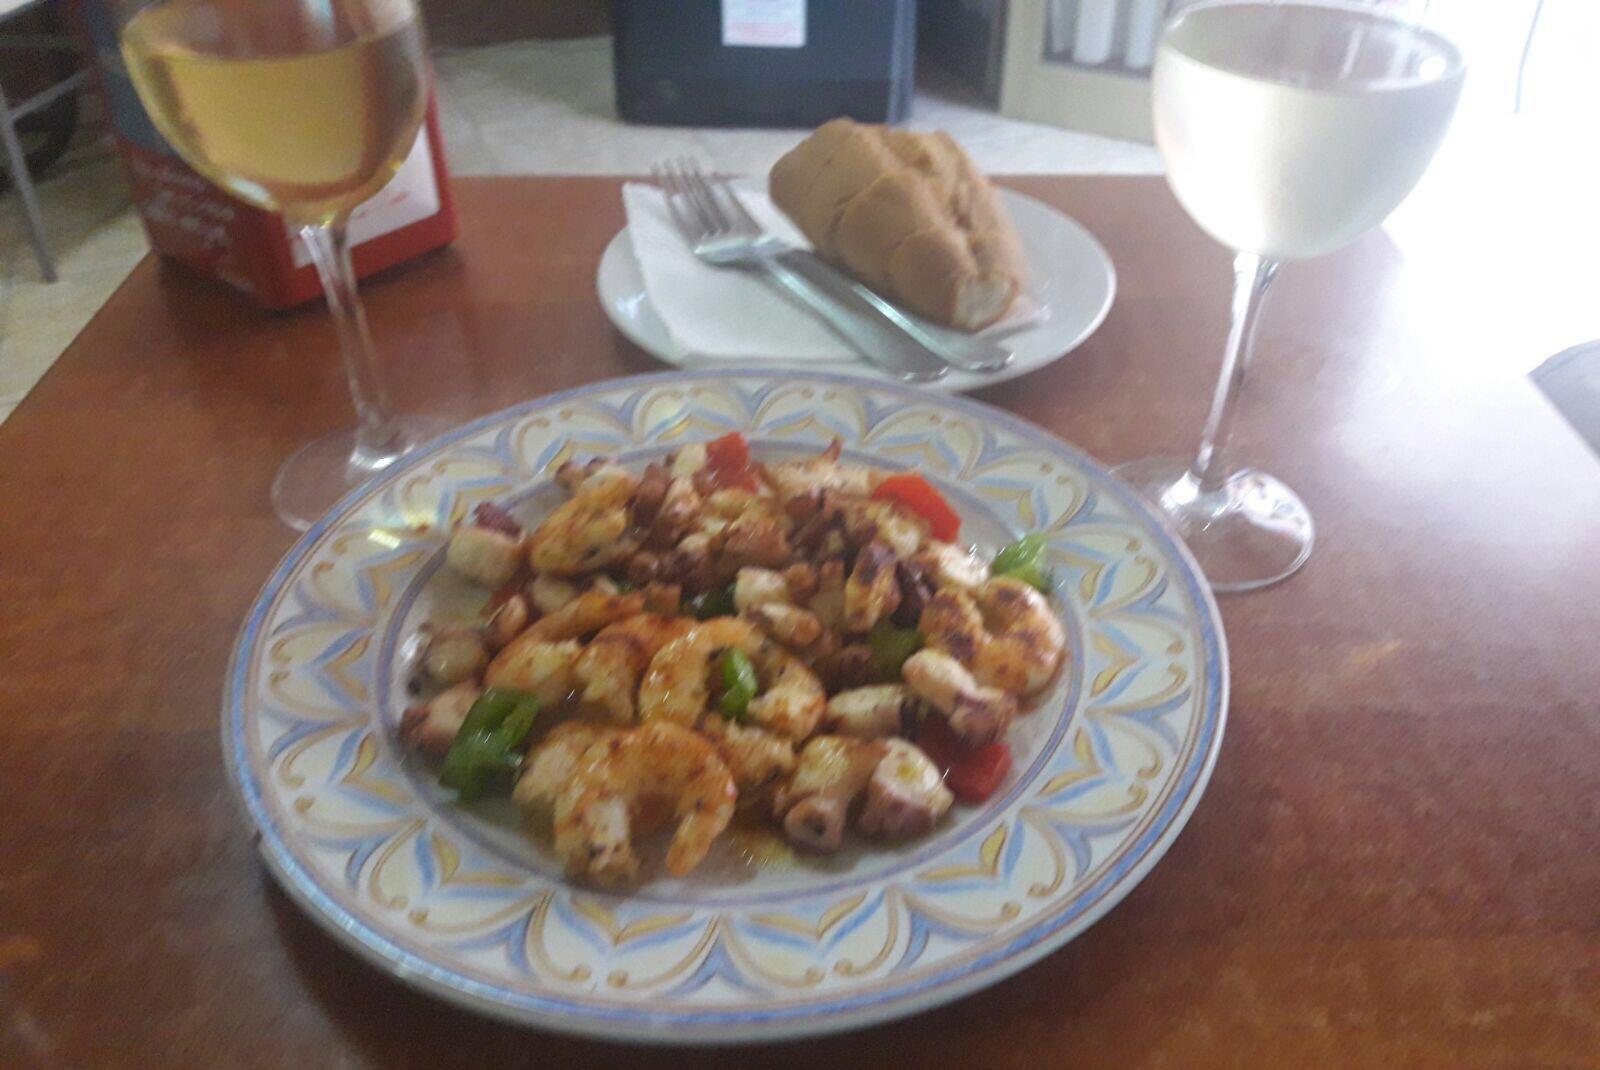 Guachinche-4-hour-Gastronomic-Tour-in-Tenerife-9